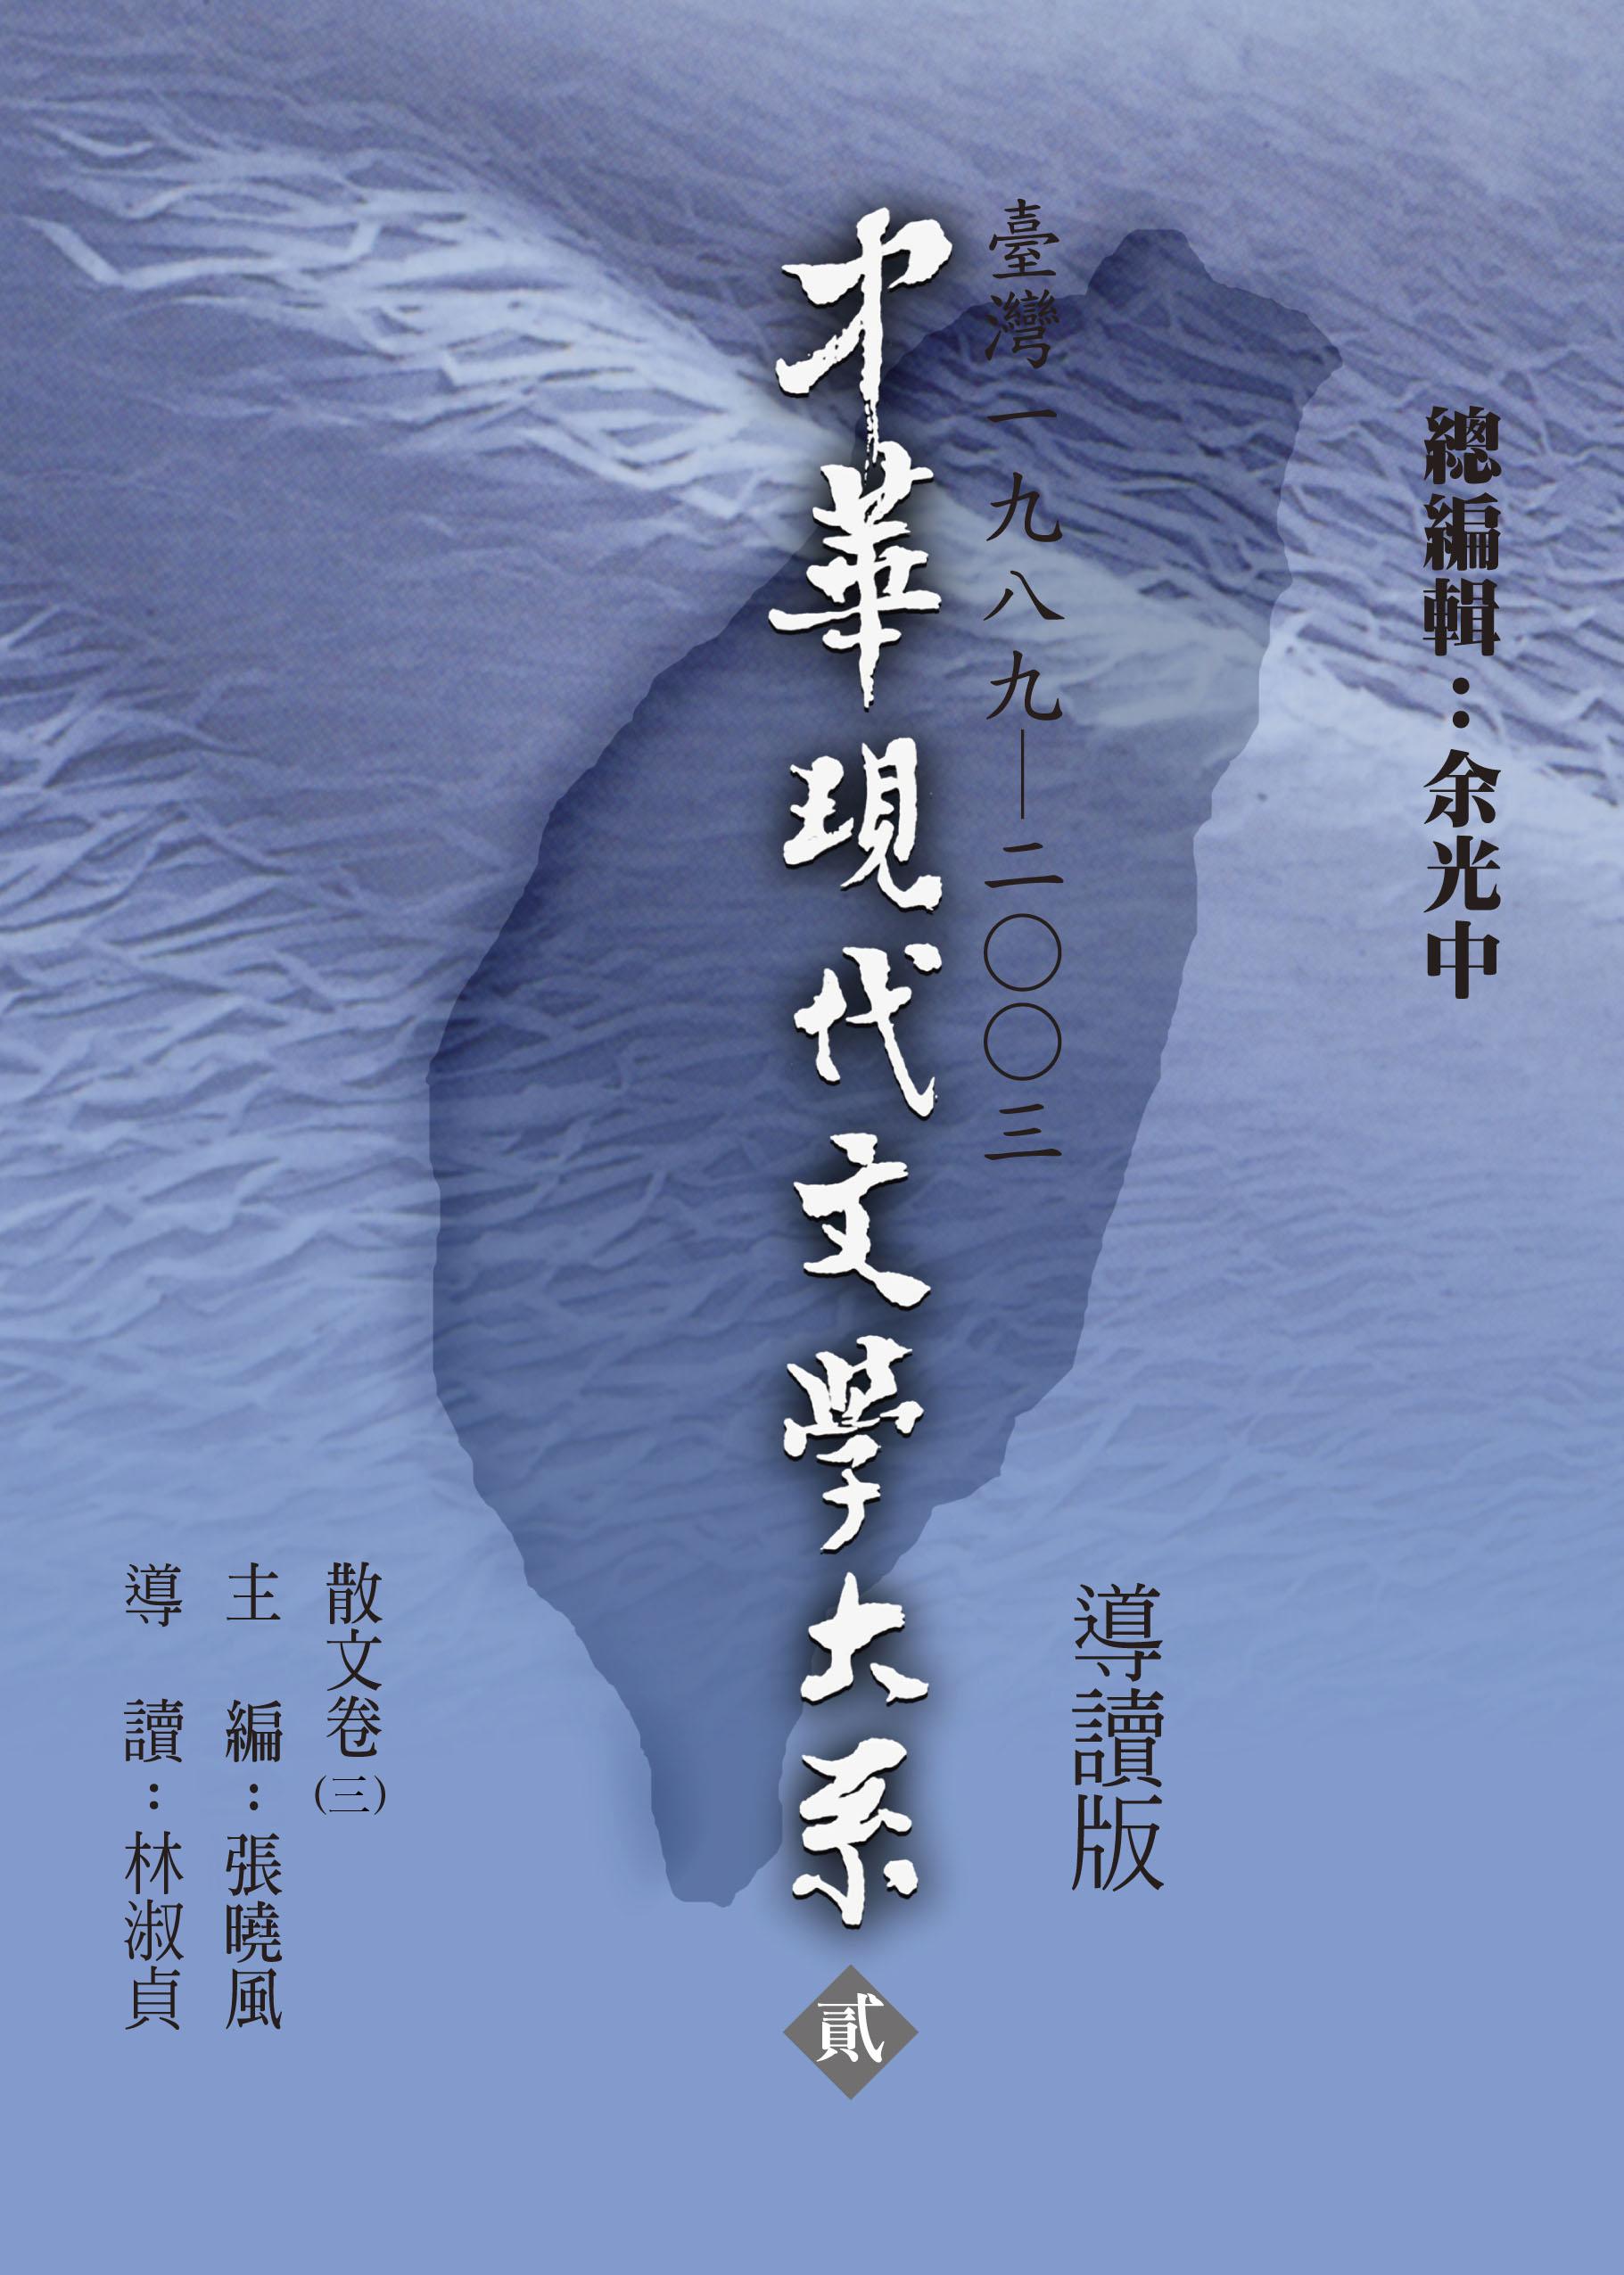 Kk025 中華現代文學大系二散文卷3